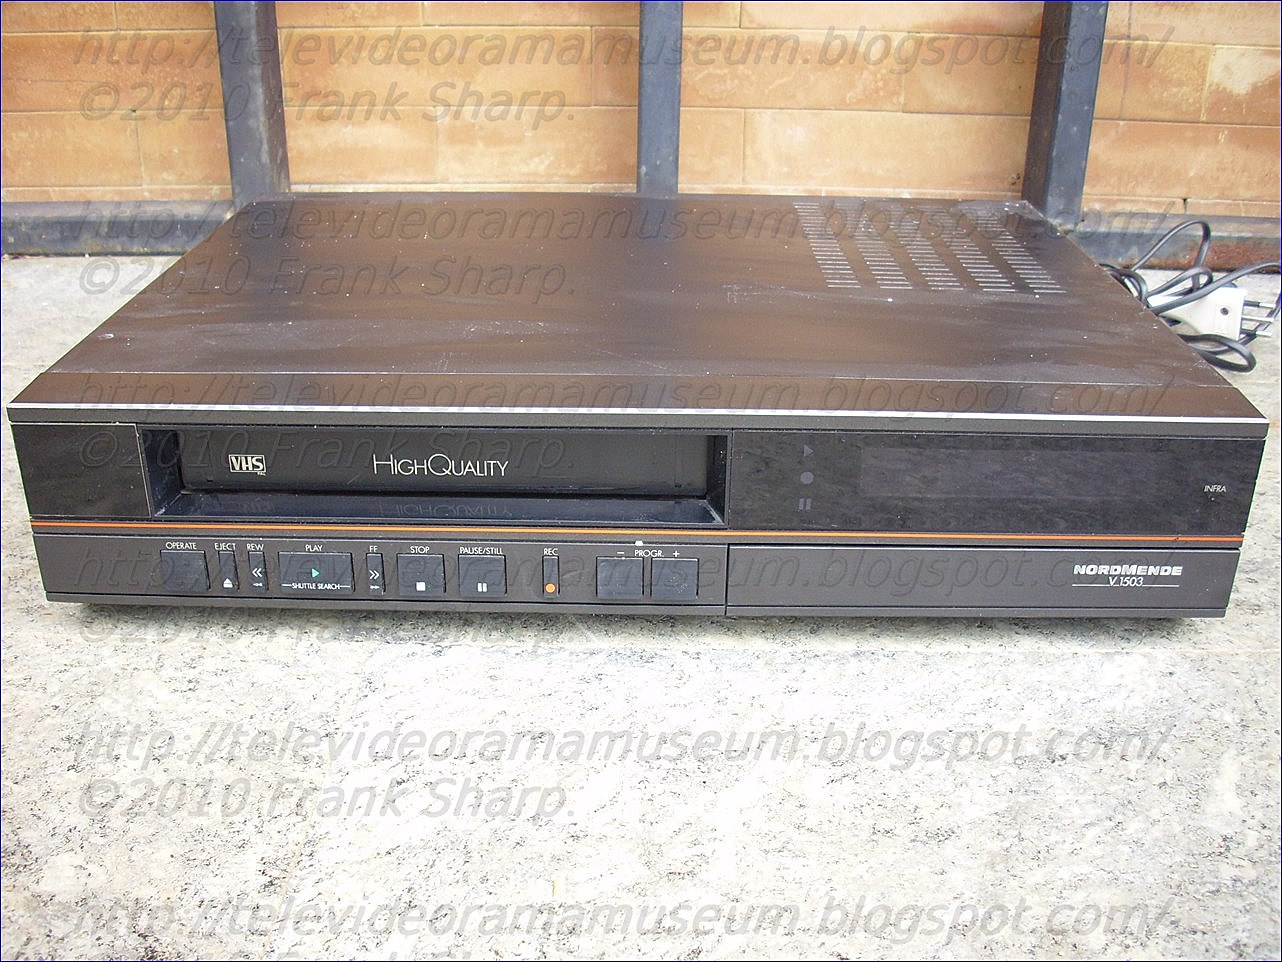 Tele Video Rama Museum !: NORDMENDE (JVC) V1503 YEAR 1988.